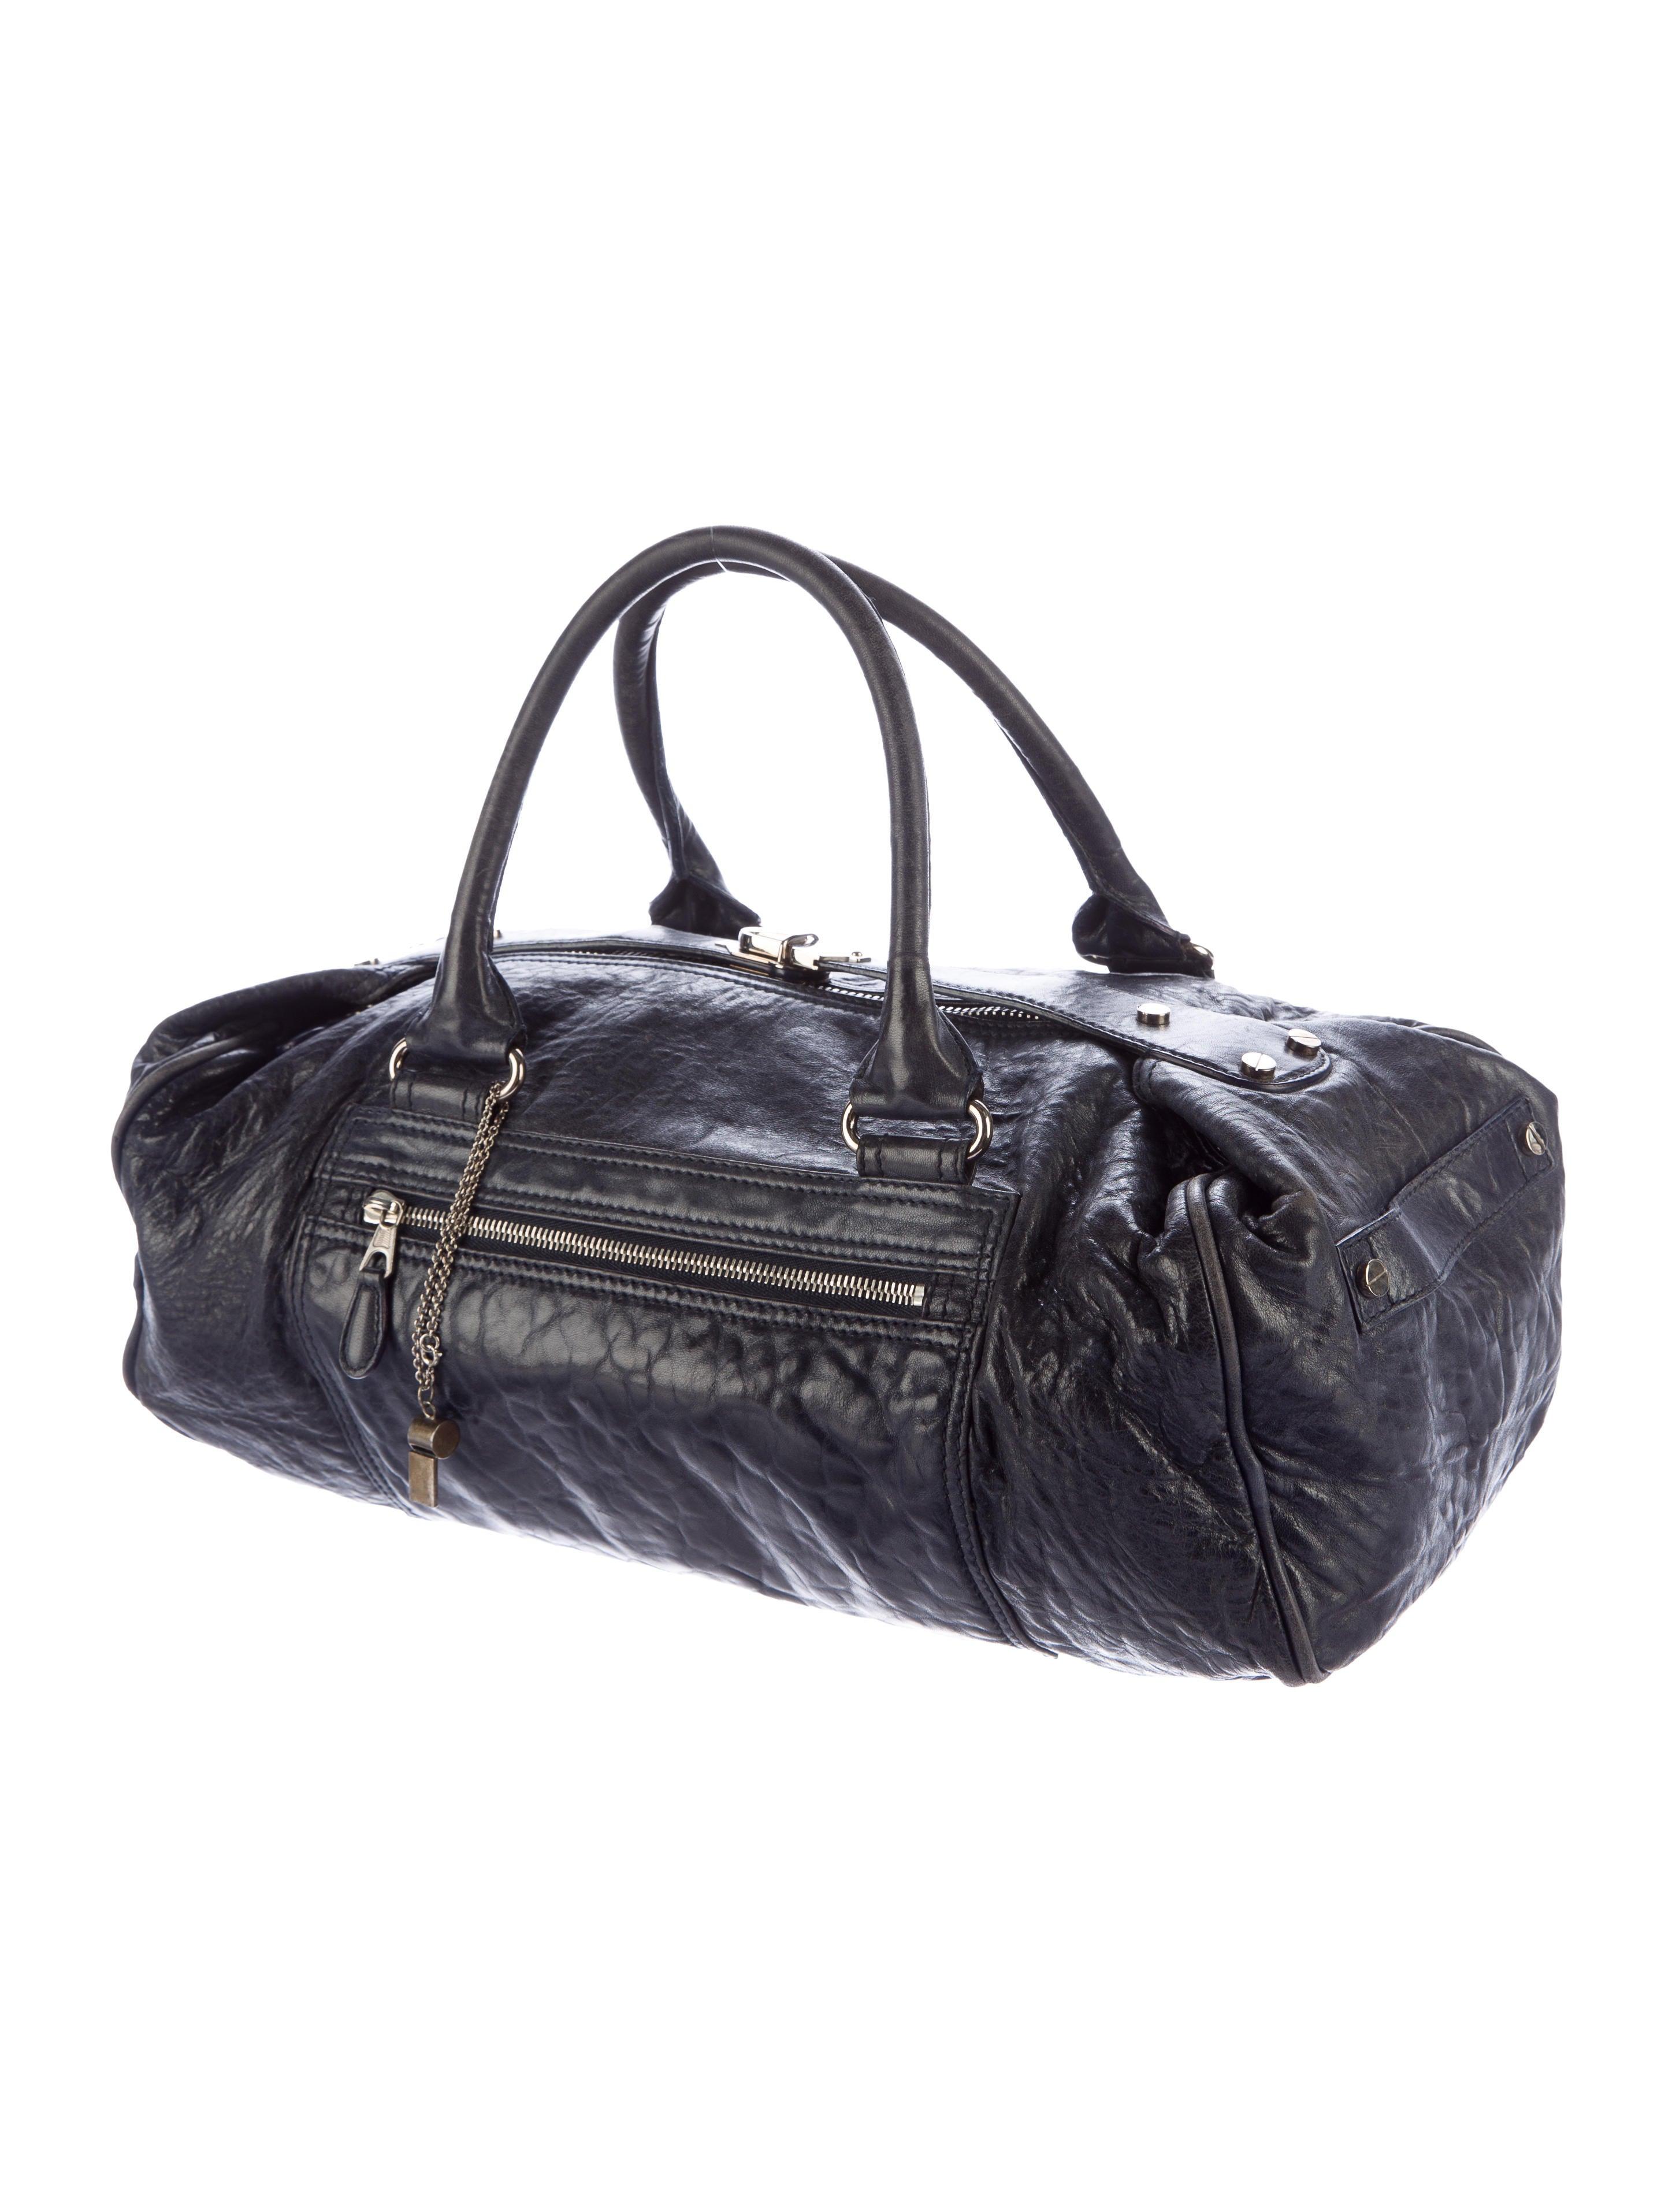 20b854a3f321 Balenciaga Leather Bag